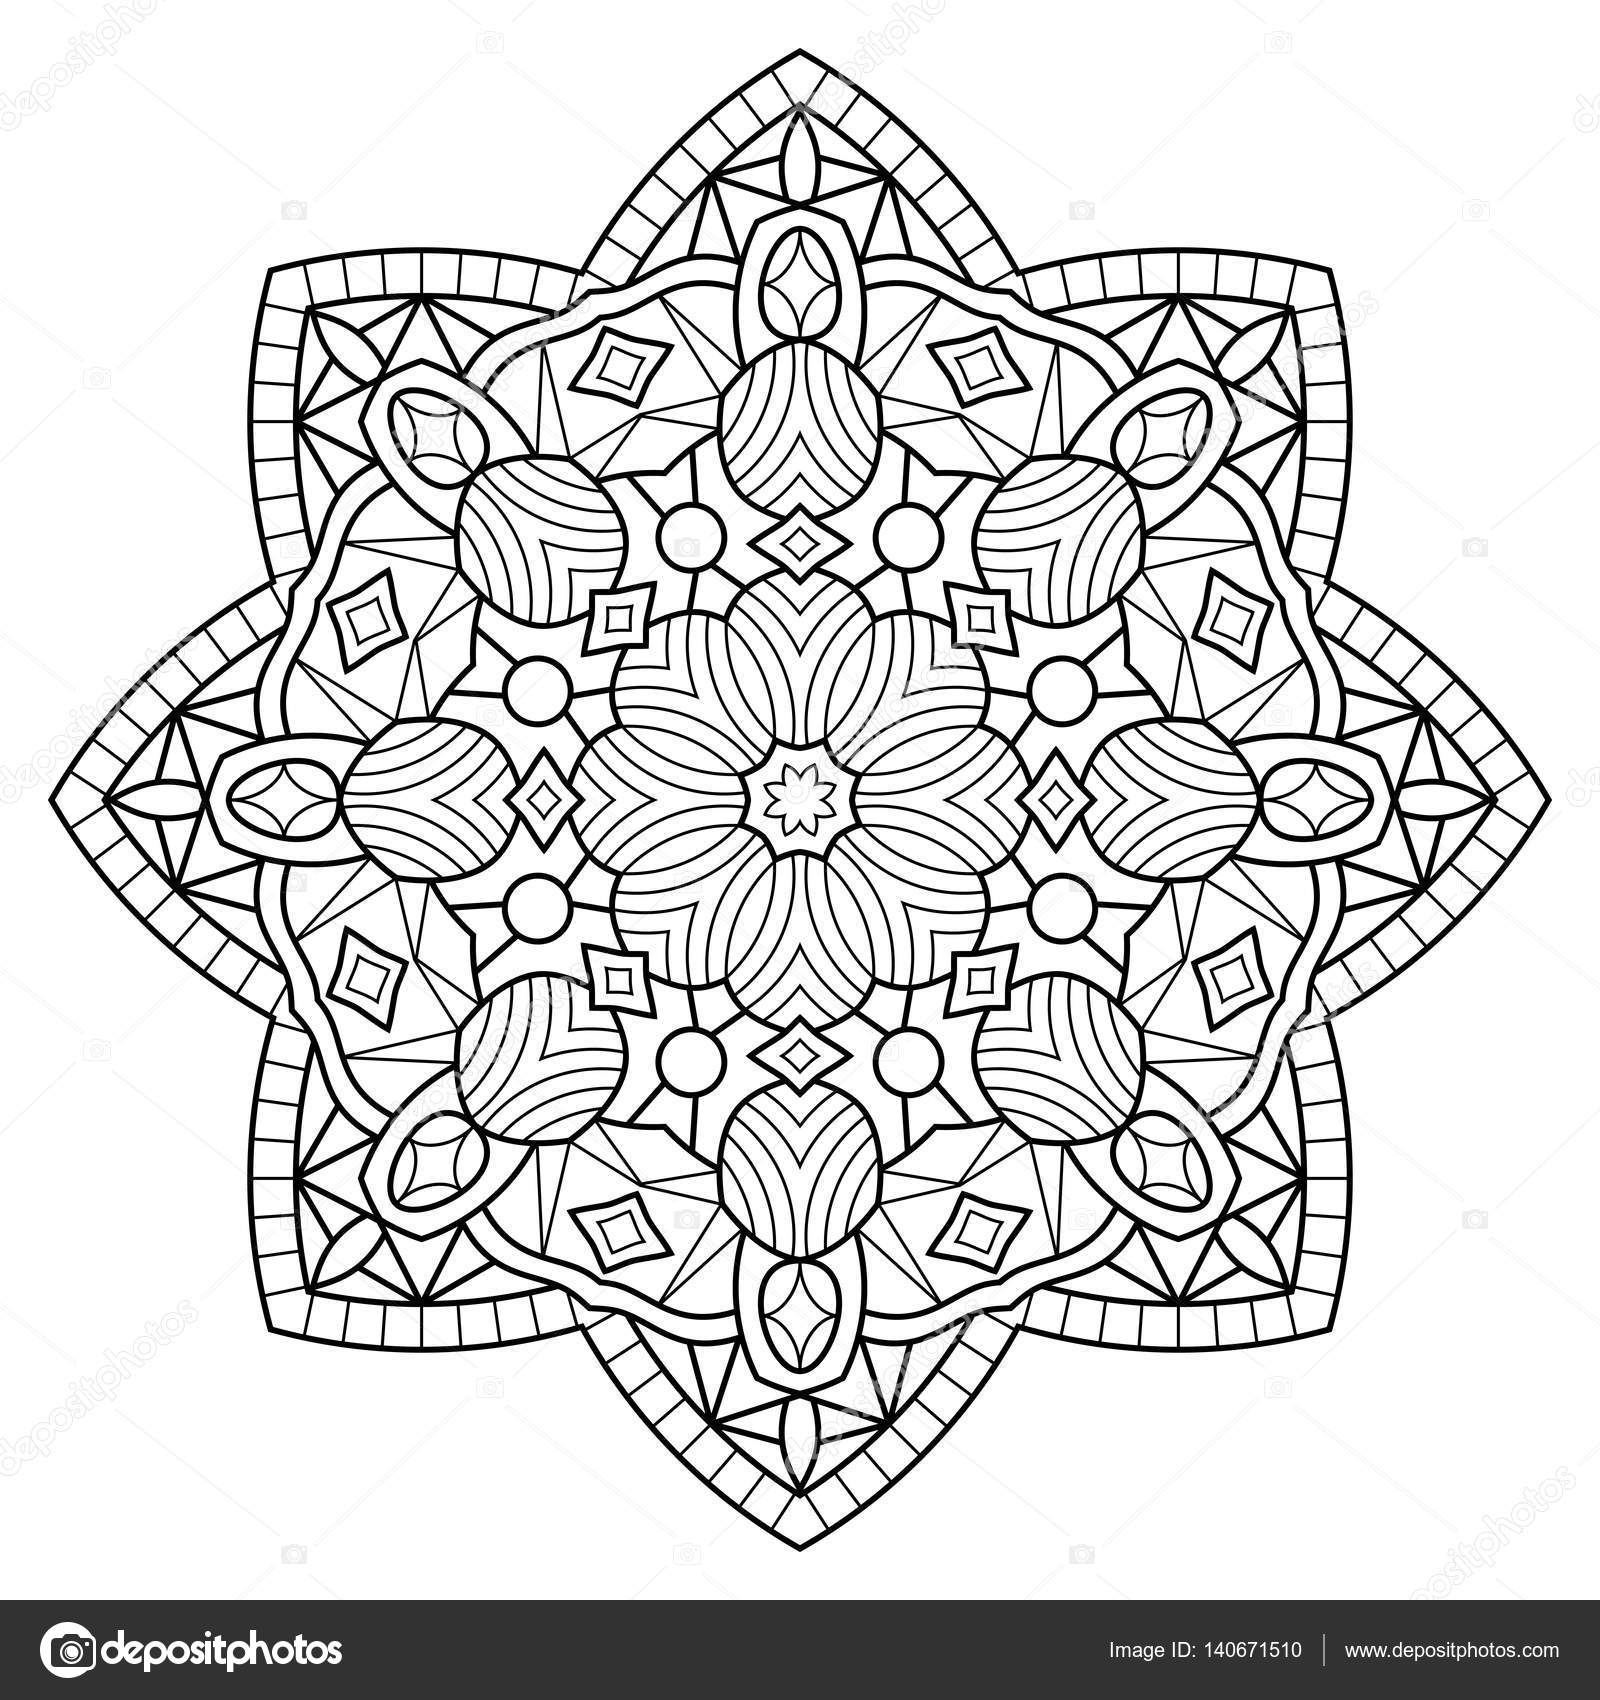 Mandala Coloring Book Pages Stock Vector C Jelisua88 140671510